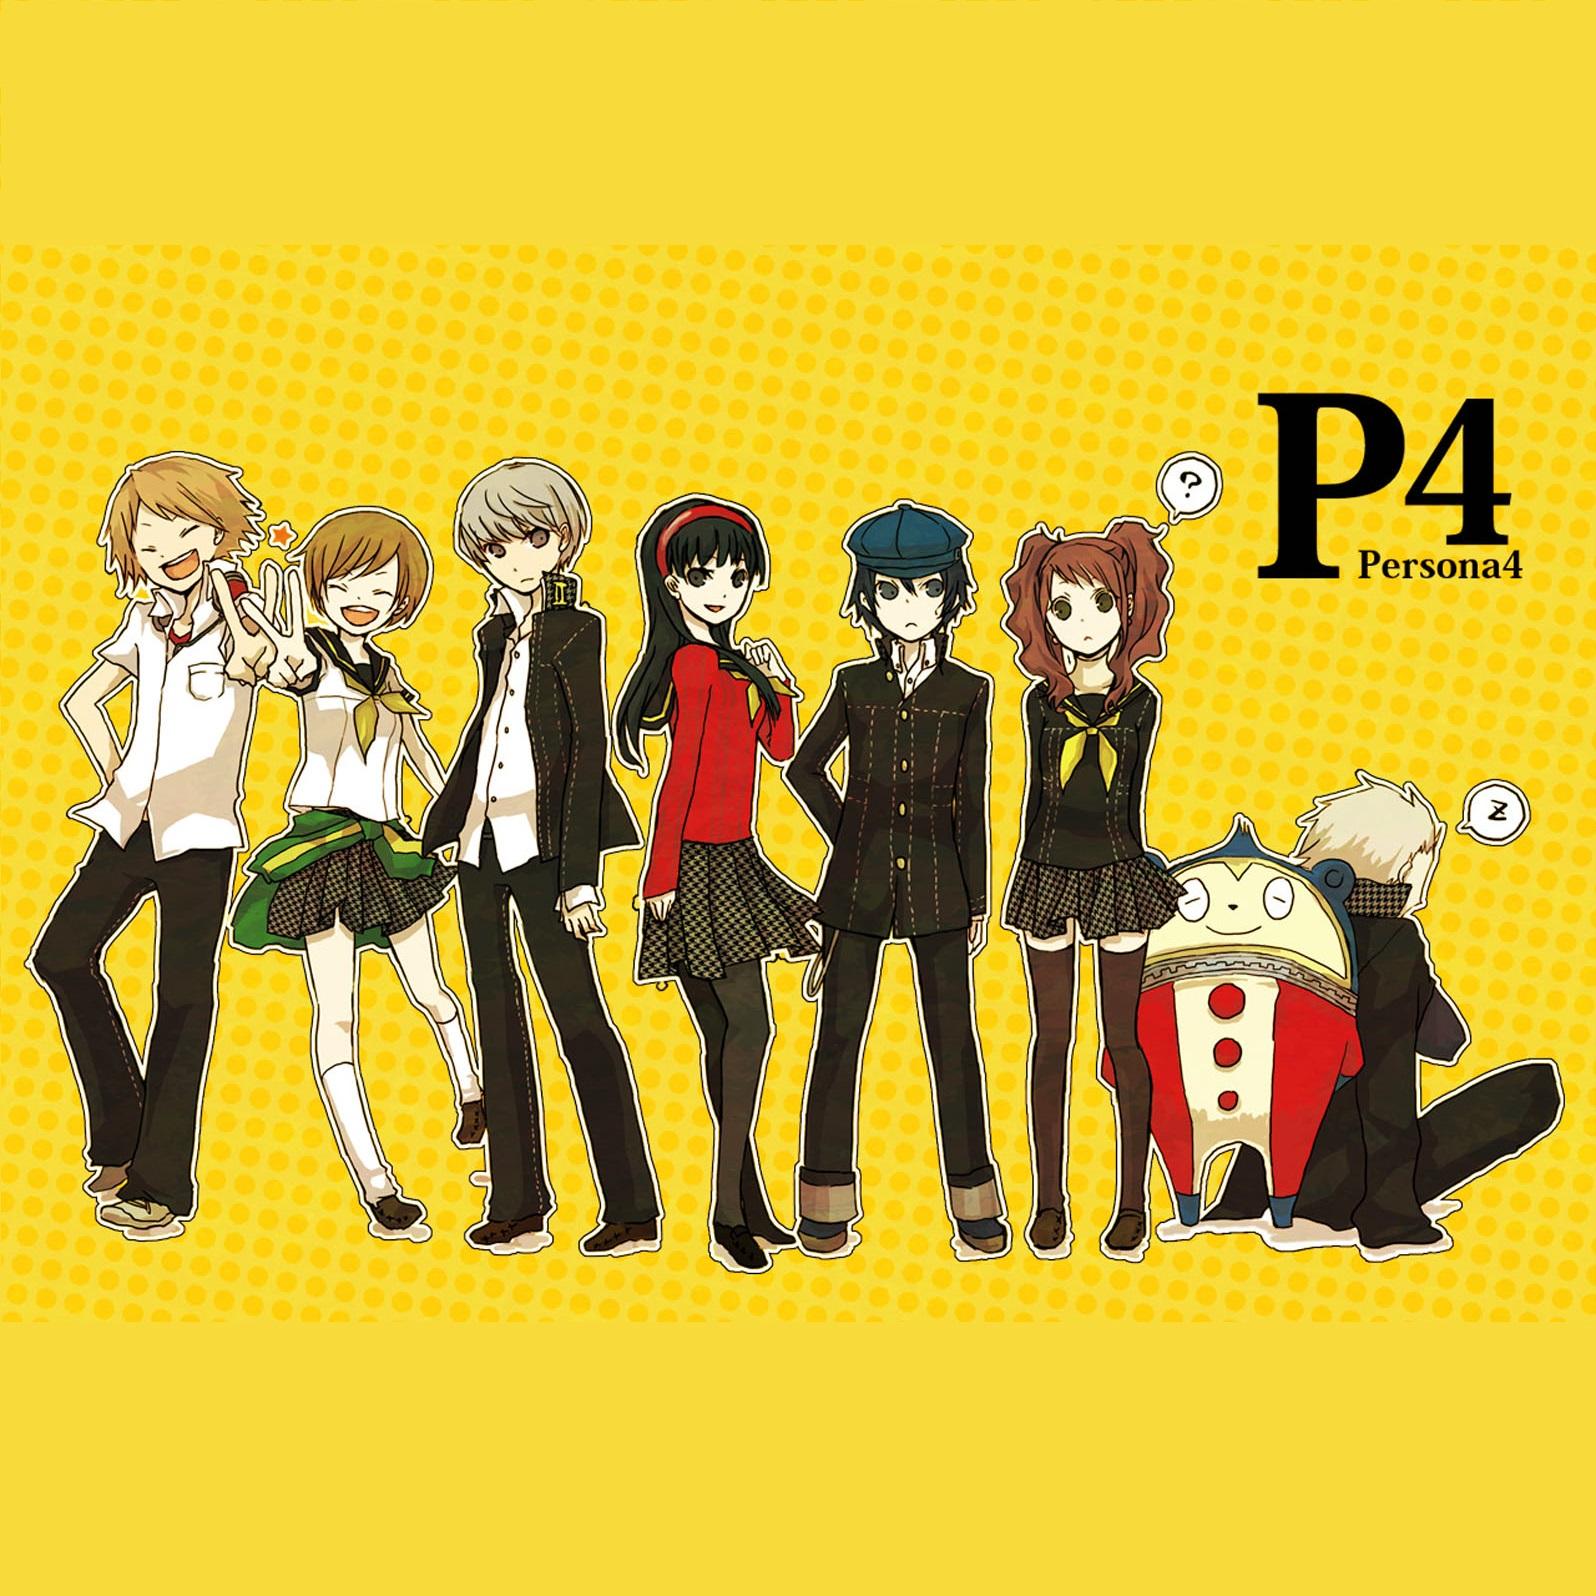 Anime 1596x1596 Persona 4 Golden Persona 4 Hanamura Yosuke Kanji Tatsumi Kuma Persona 4 Shirogane Naoto anime Satonaka Chie Amagi Yukiko Kujikawa Rise